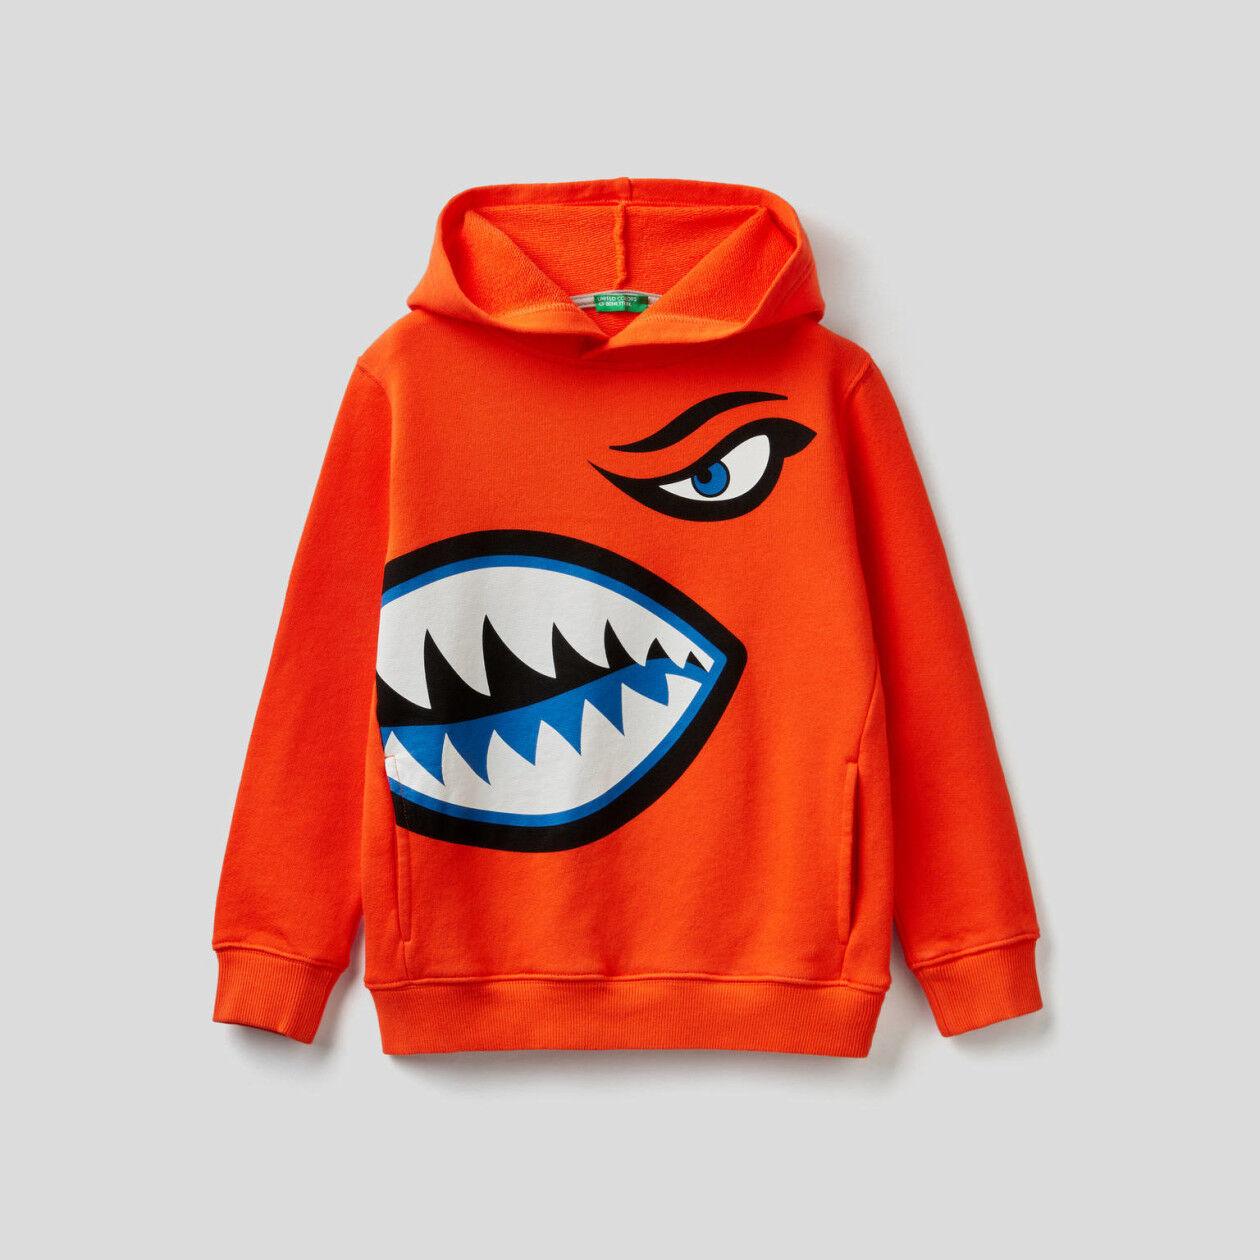 100% cotton sweatshirt with maxi print